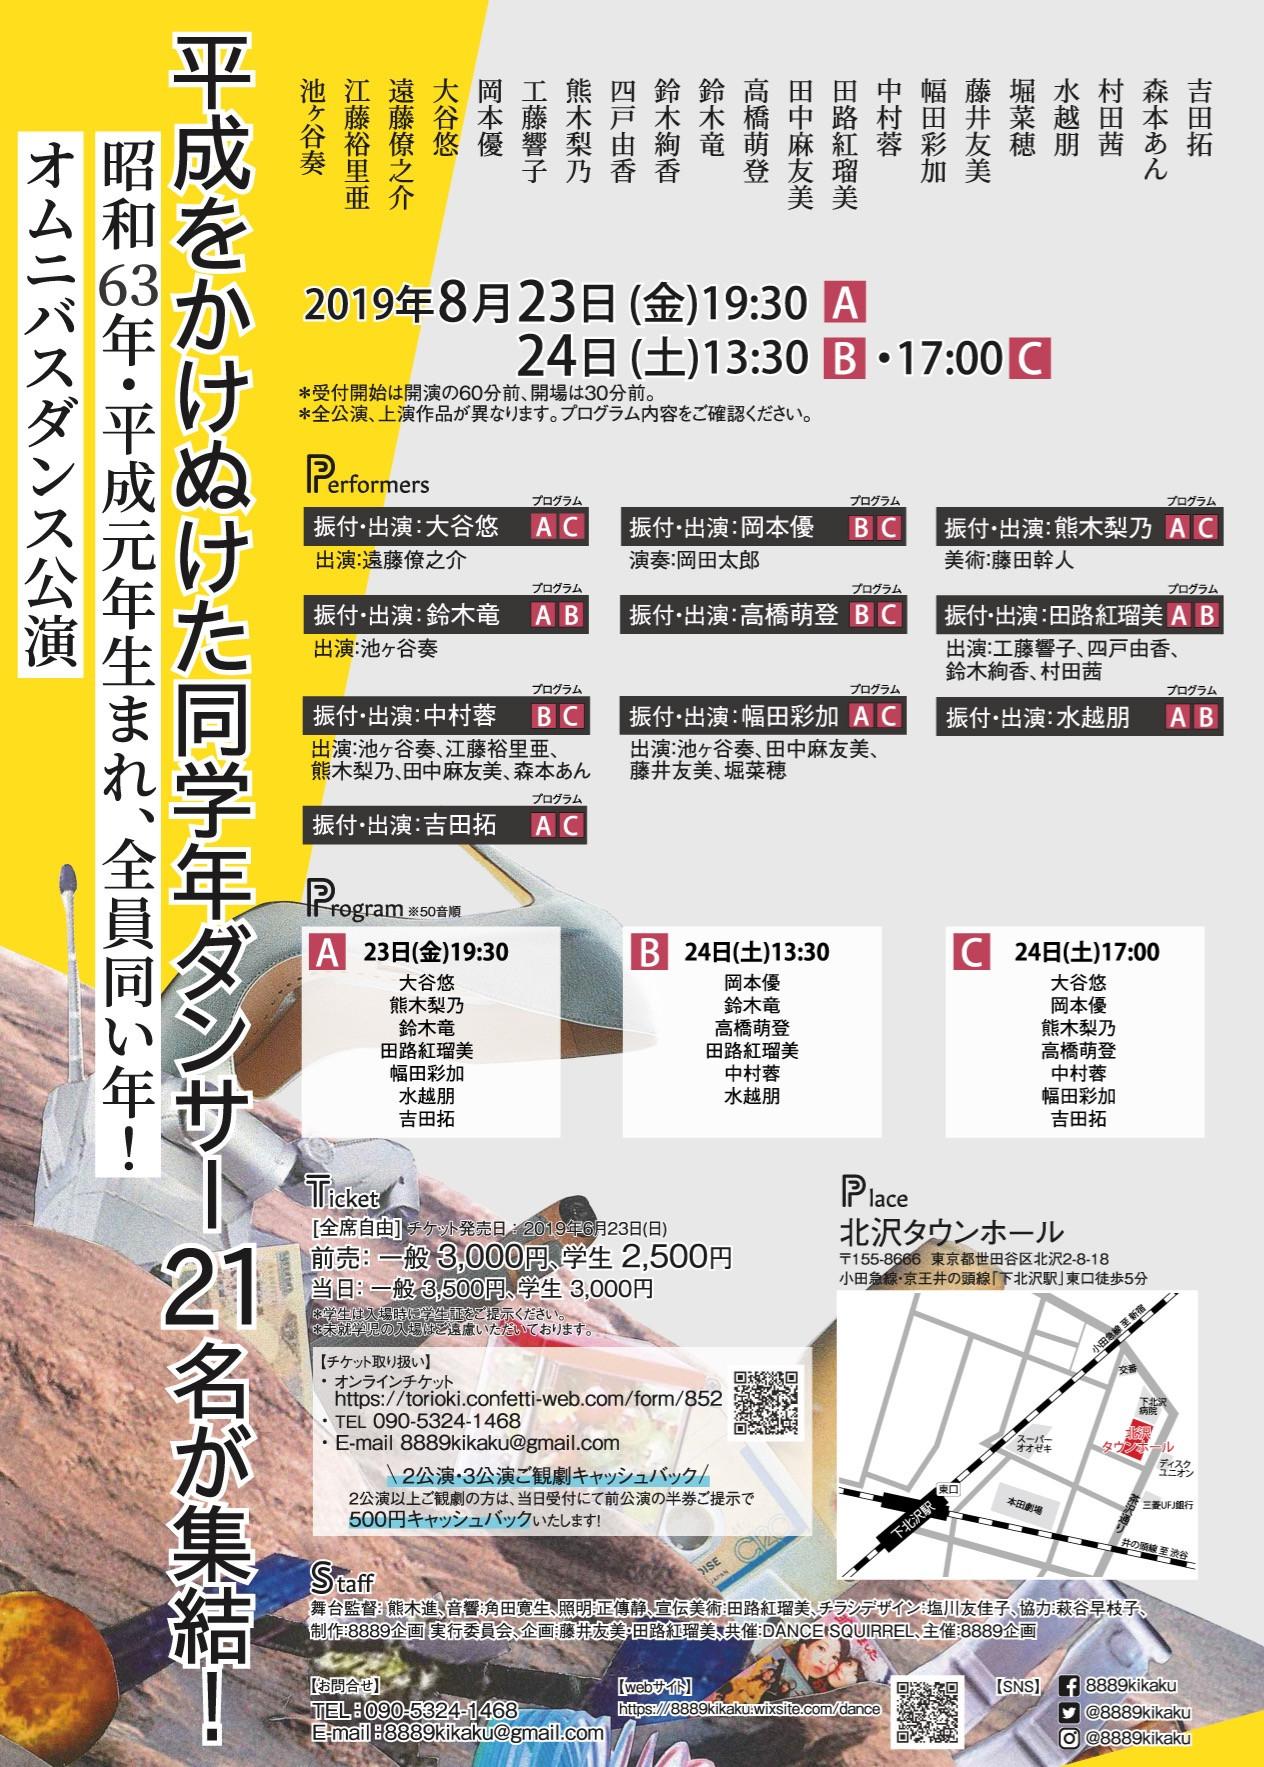 8889kikaku-senden(内側) _edited.jpg